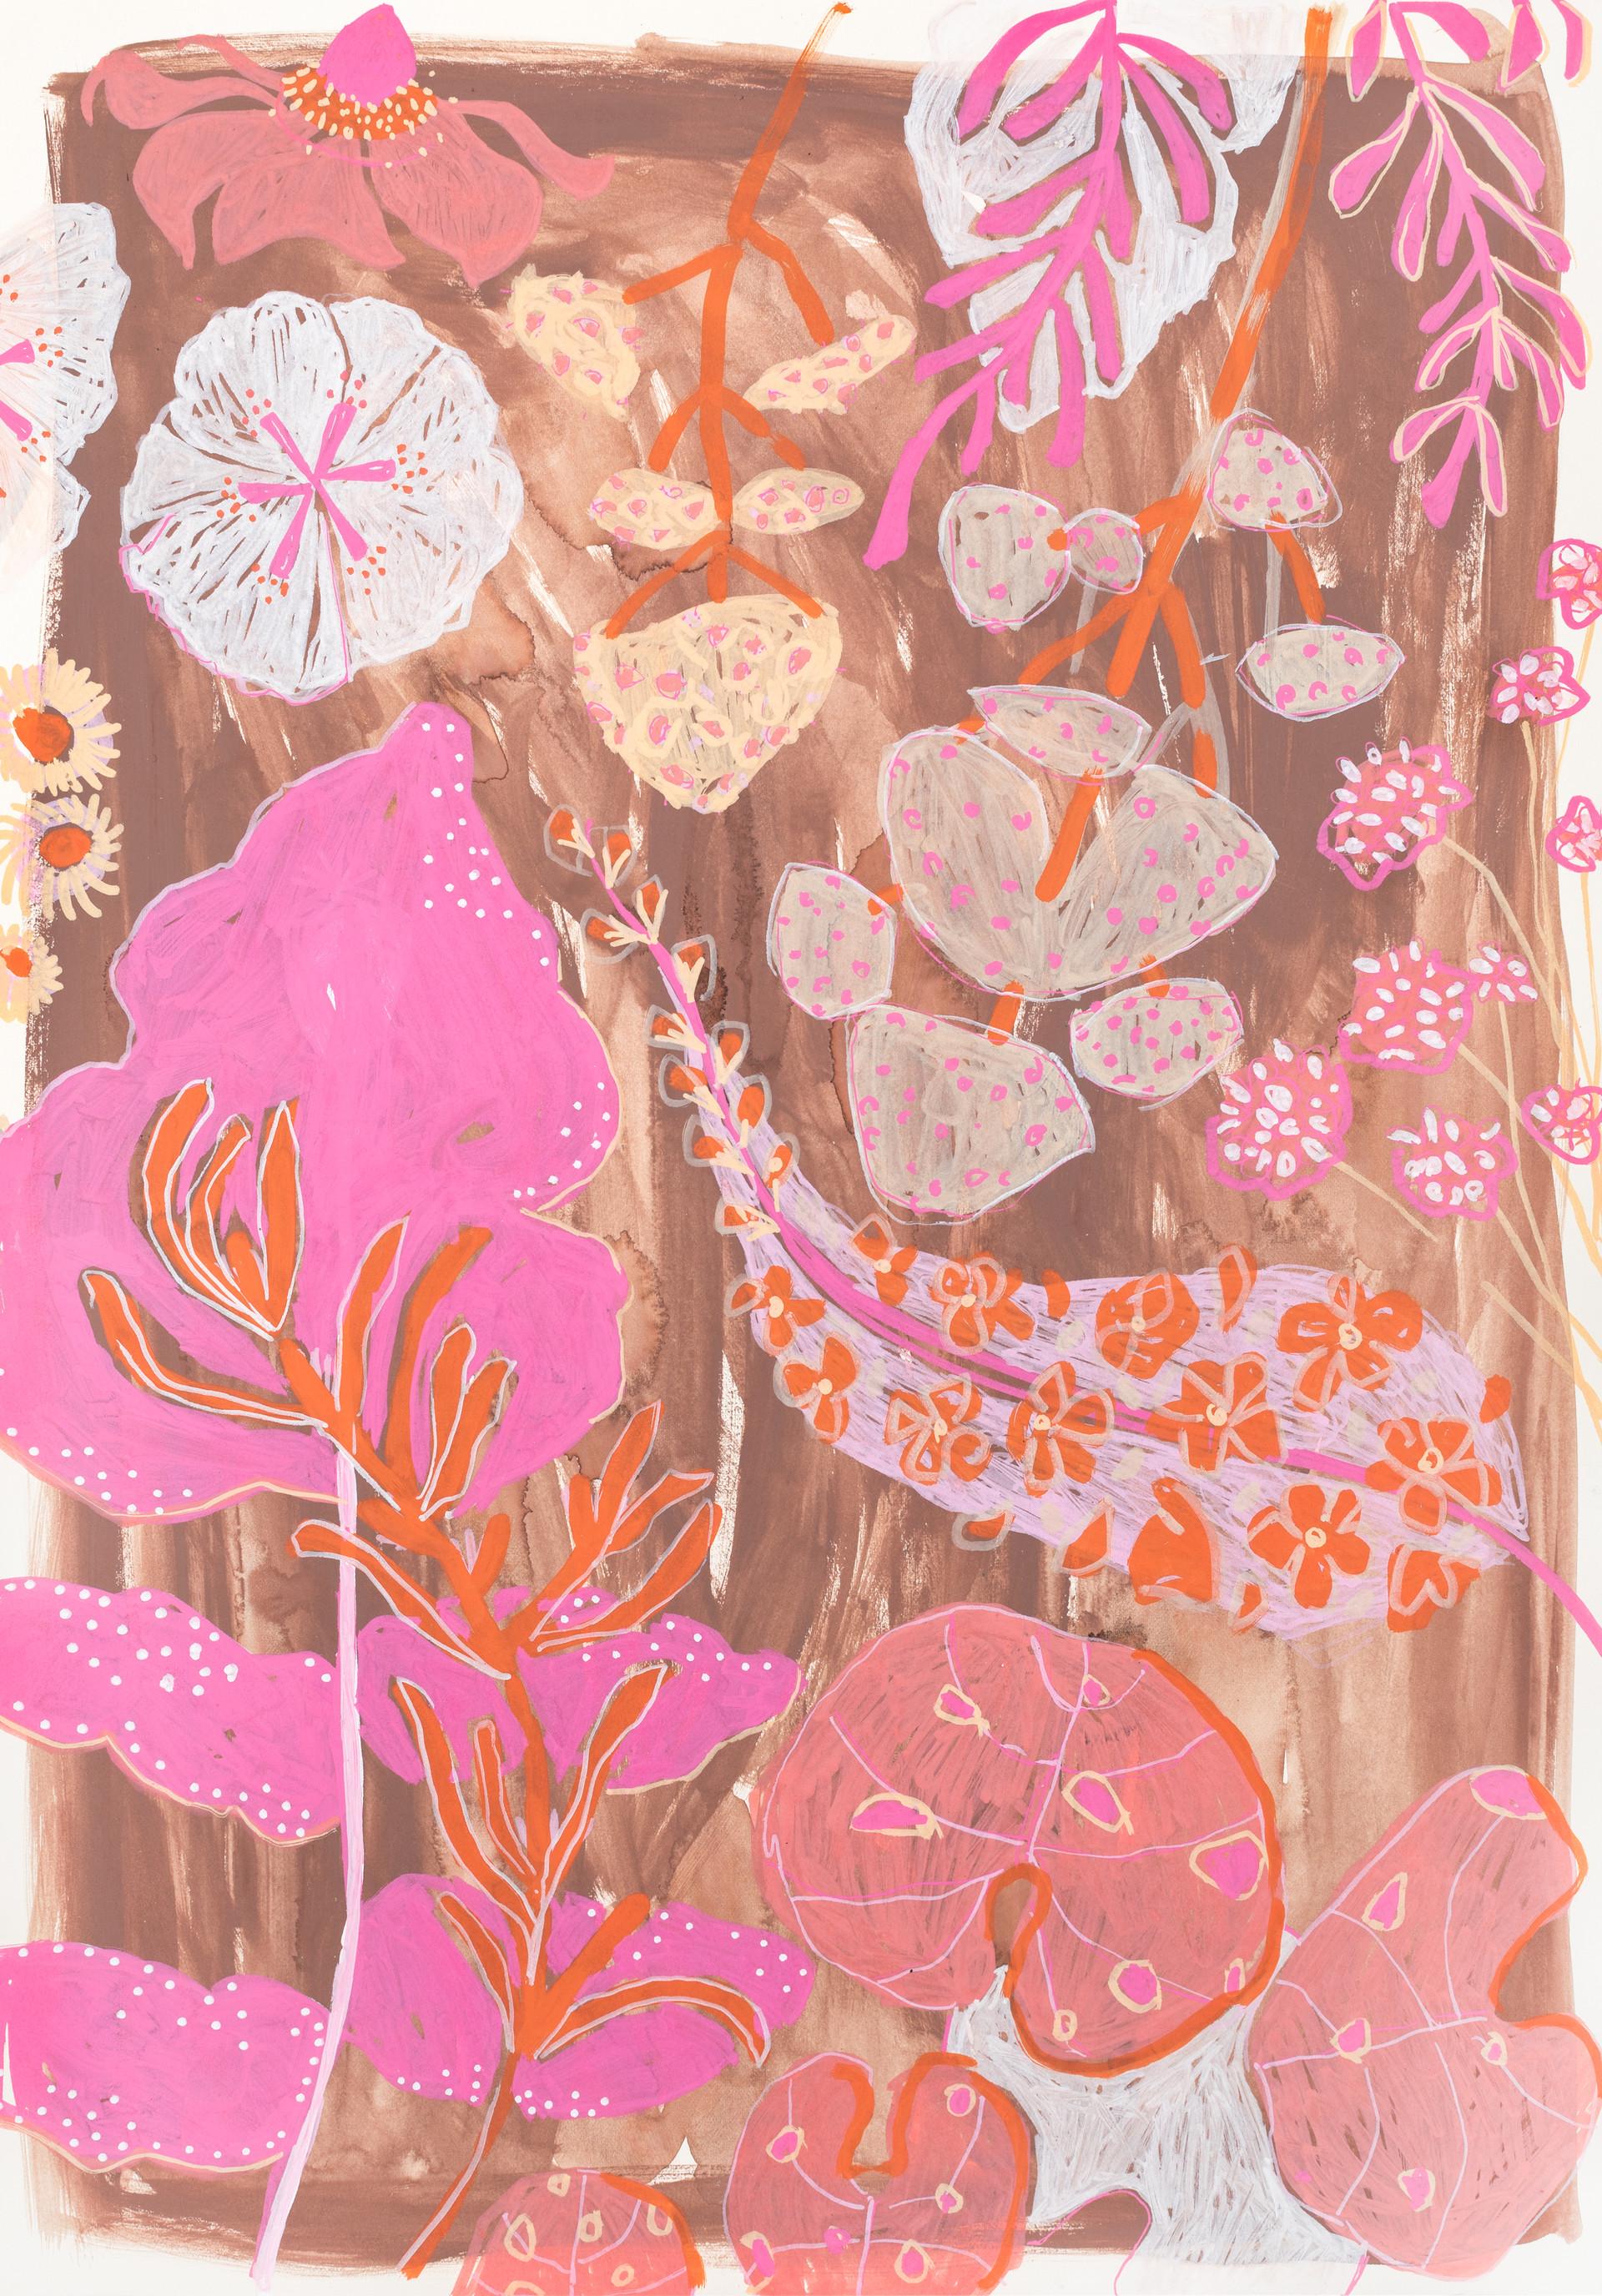 Pinks & Browns II